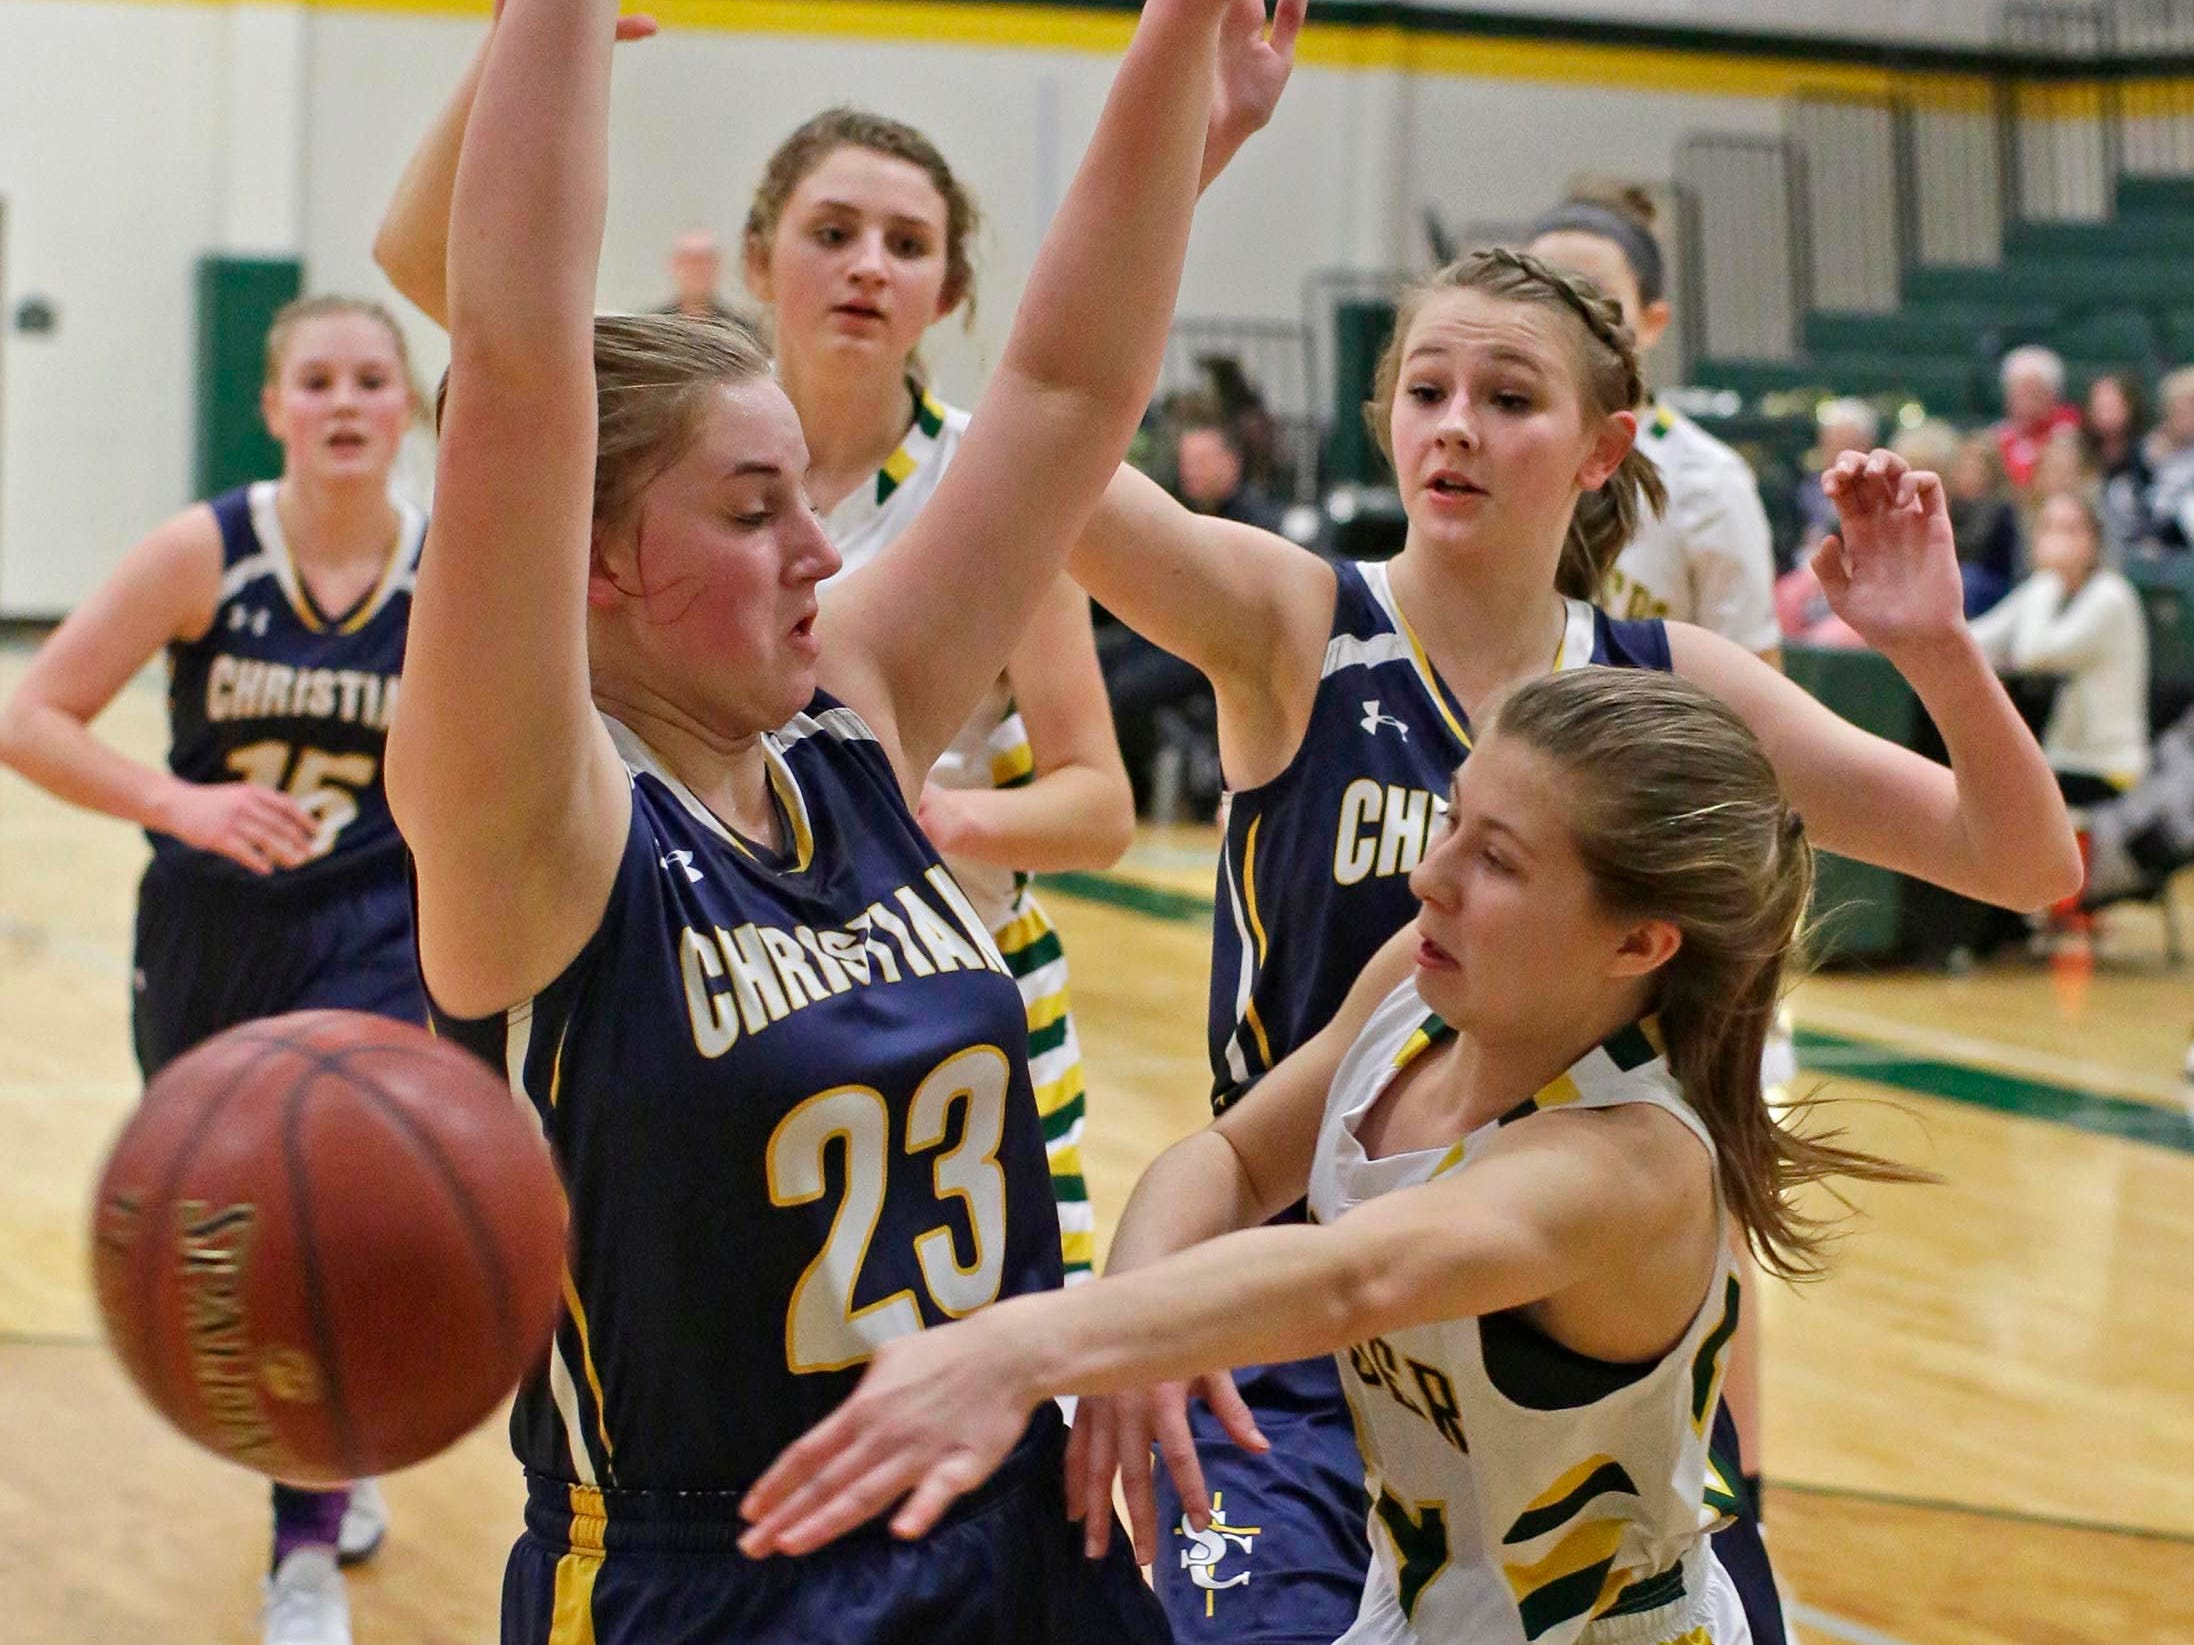 Sheboygan Lutheran's Hailey Schimberg (24) passes the ball by Sheboygan Christian's Olivia Heinen (23), Thursday, January 24, 2019, in Sheboygan, Wis.